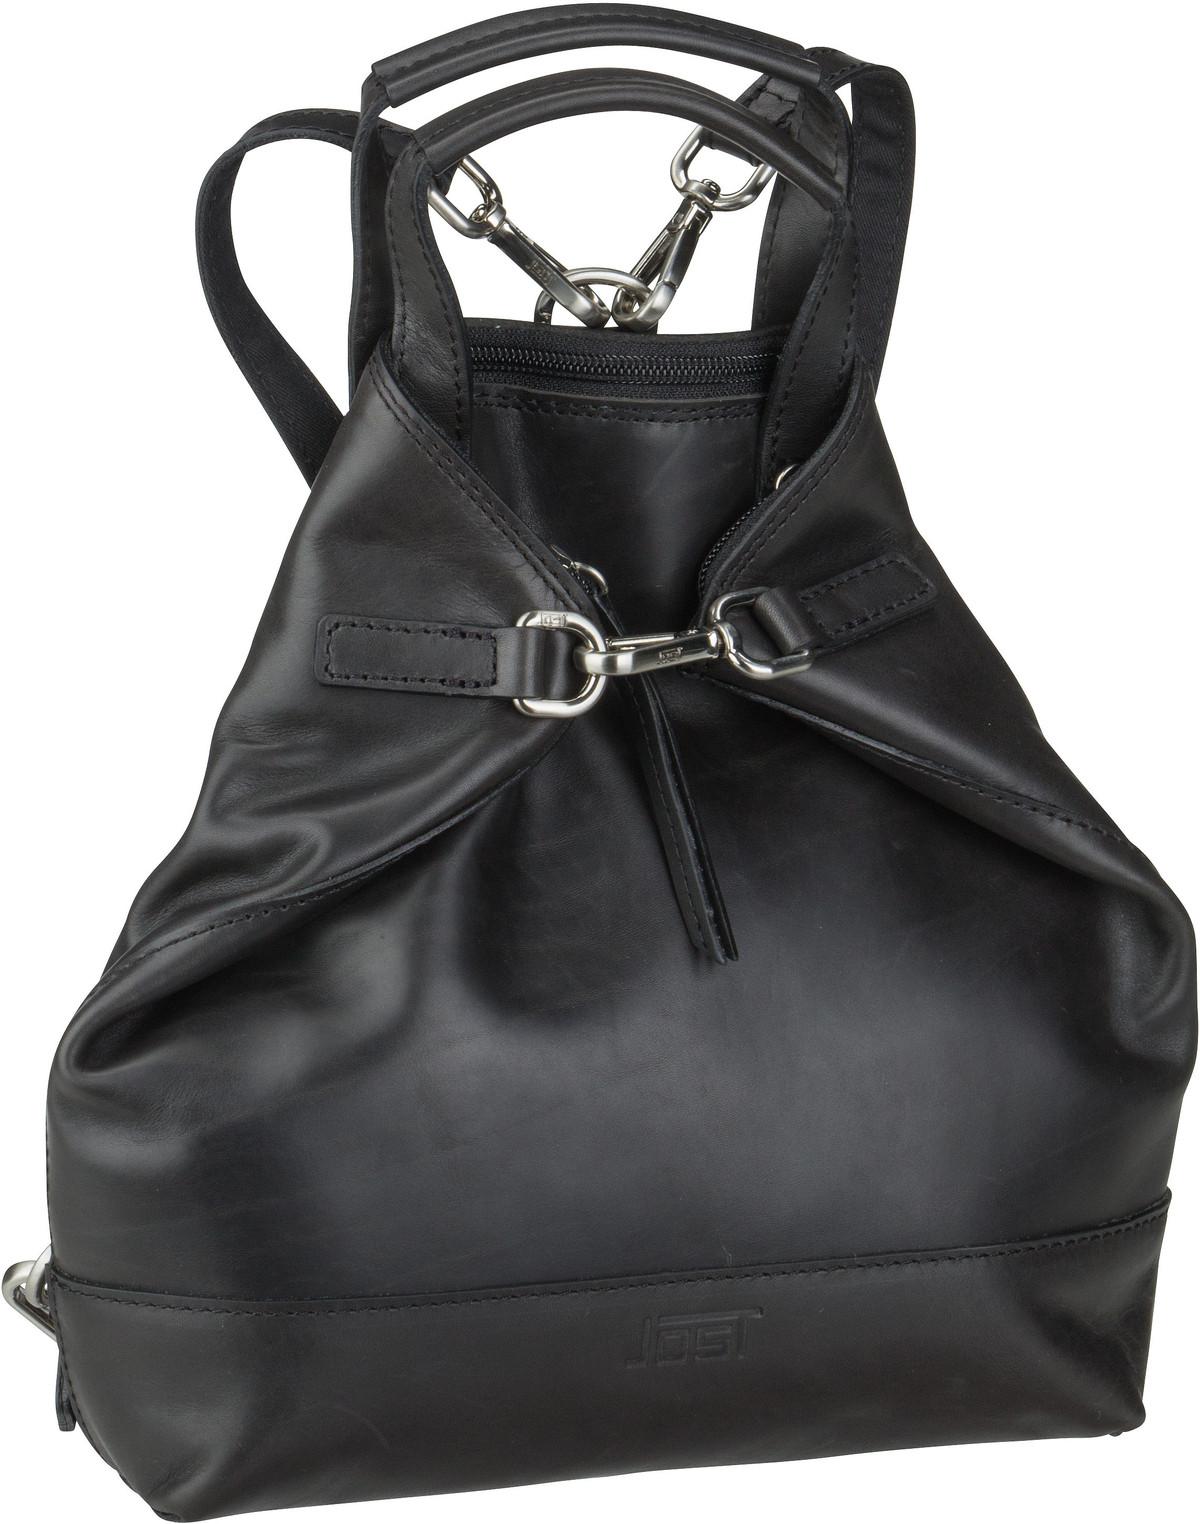 Rucksack / Daypack Rana 1276 X-Change Bag Mini Black